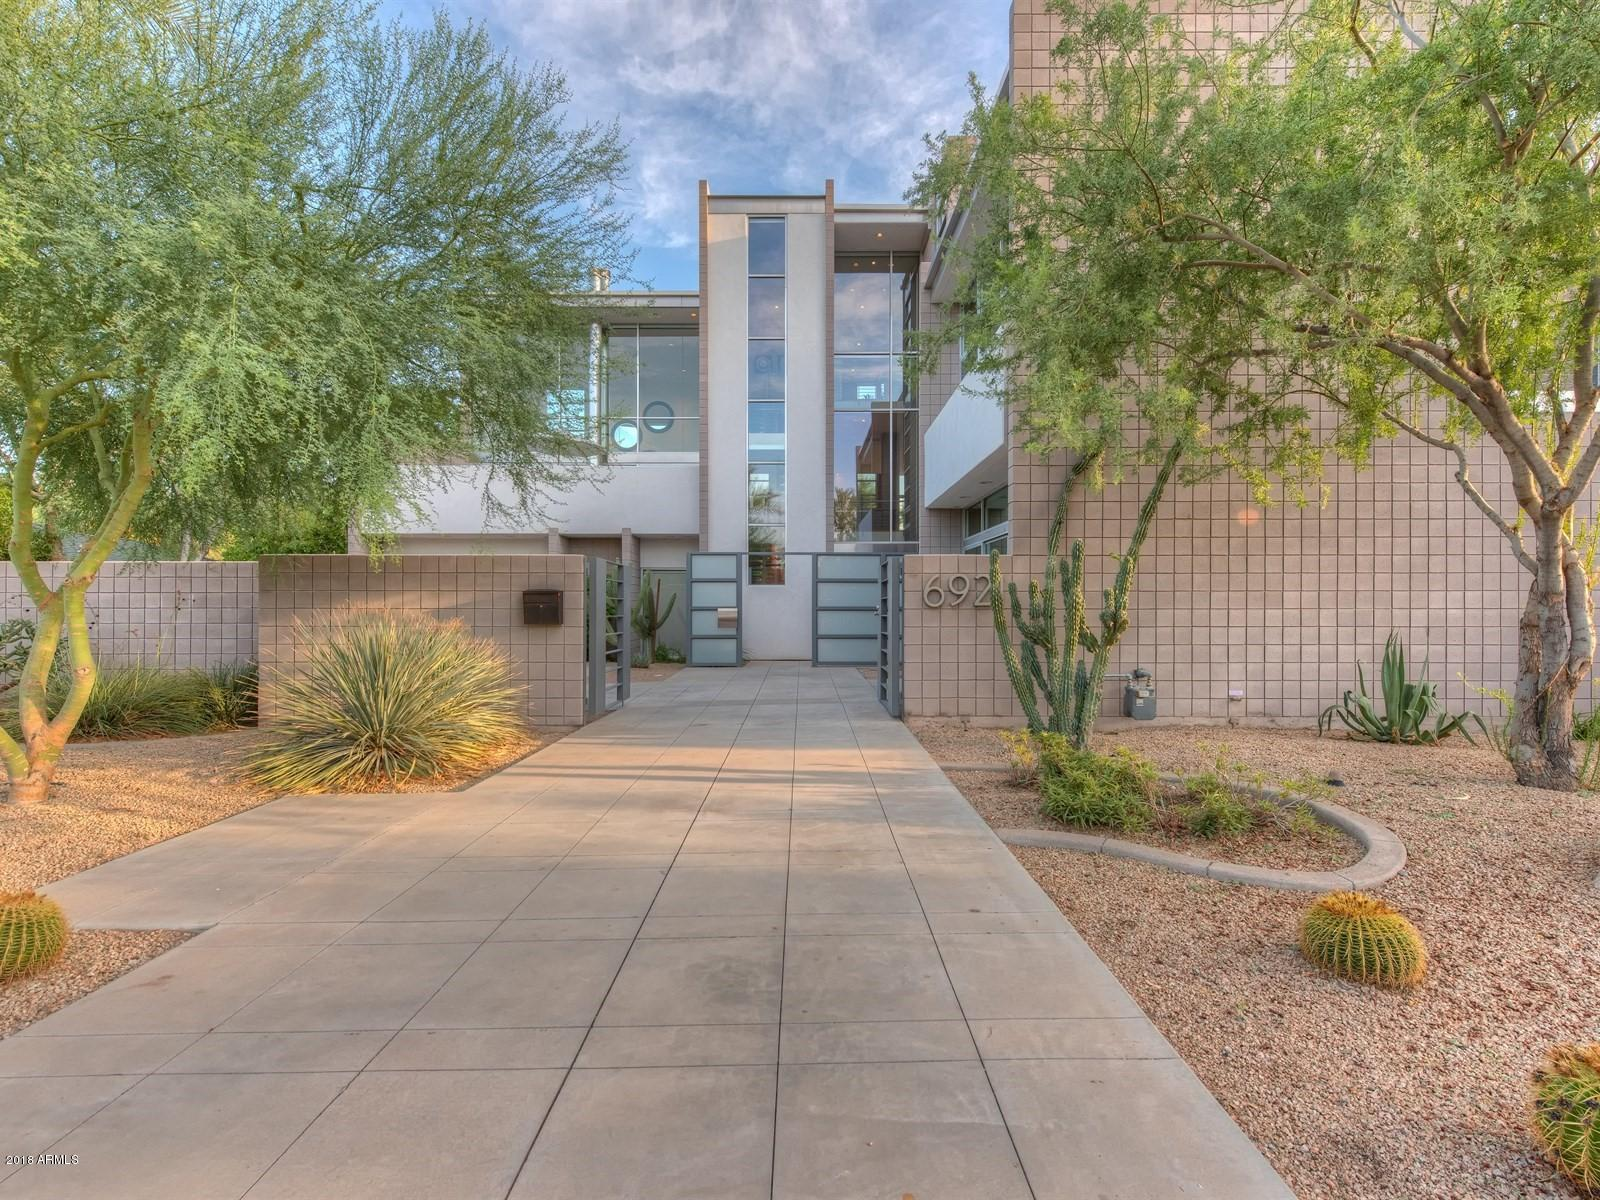 MLS 5821159 6921 E 1ST Street, Scottsdale, AZ 85251 Scottsdale AZ Old Town Scottsdale